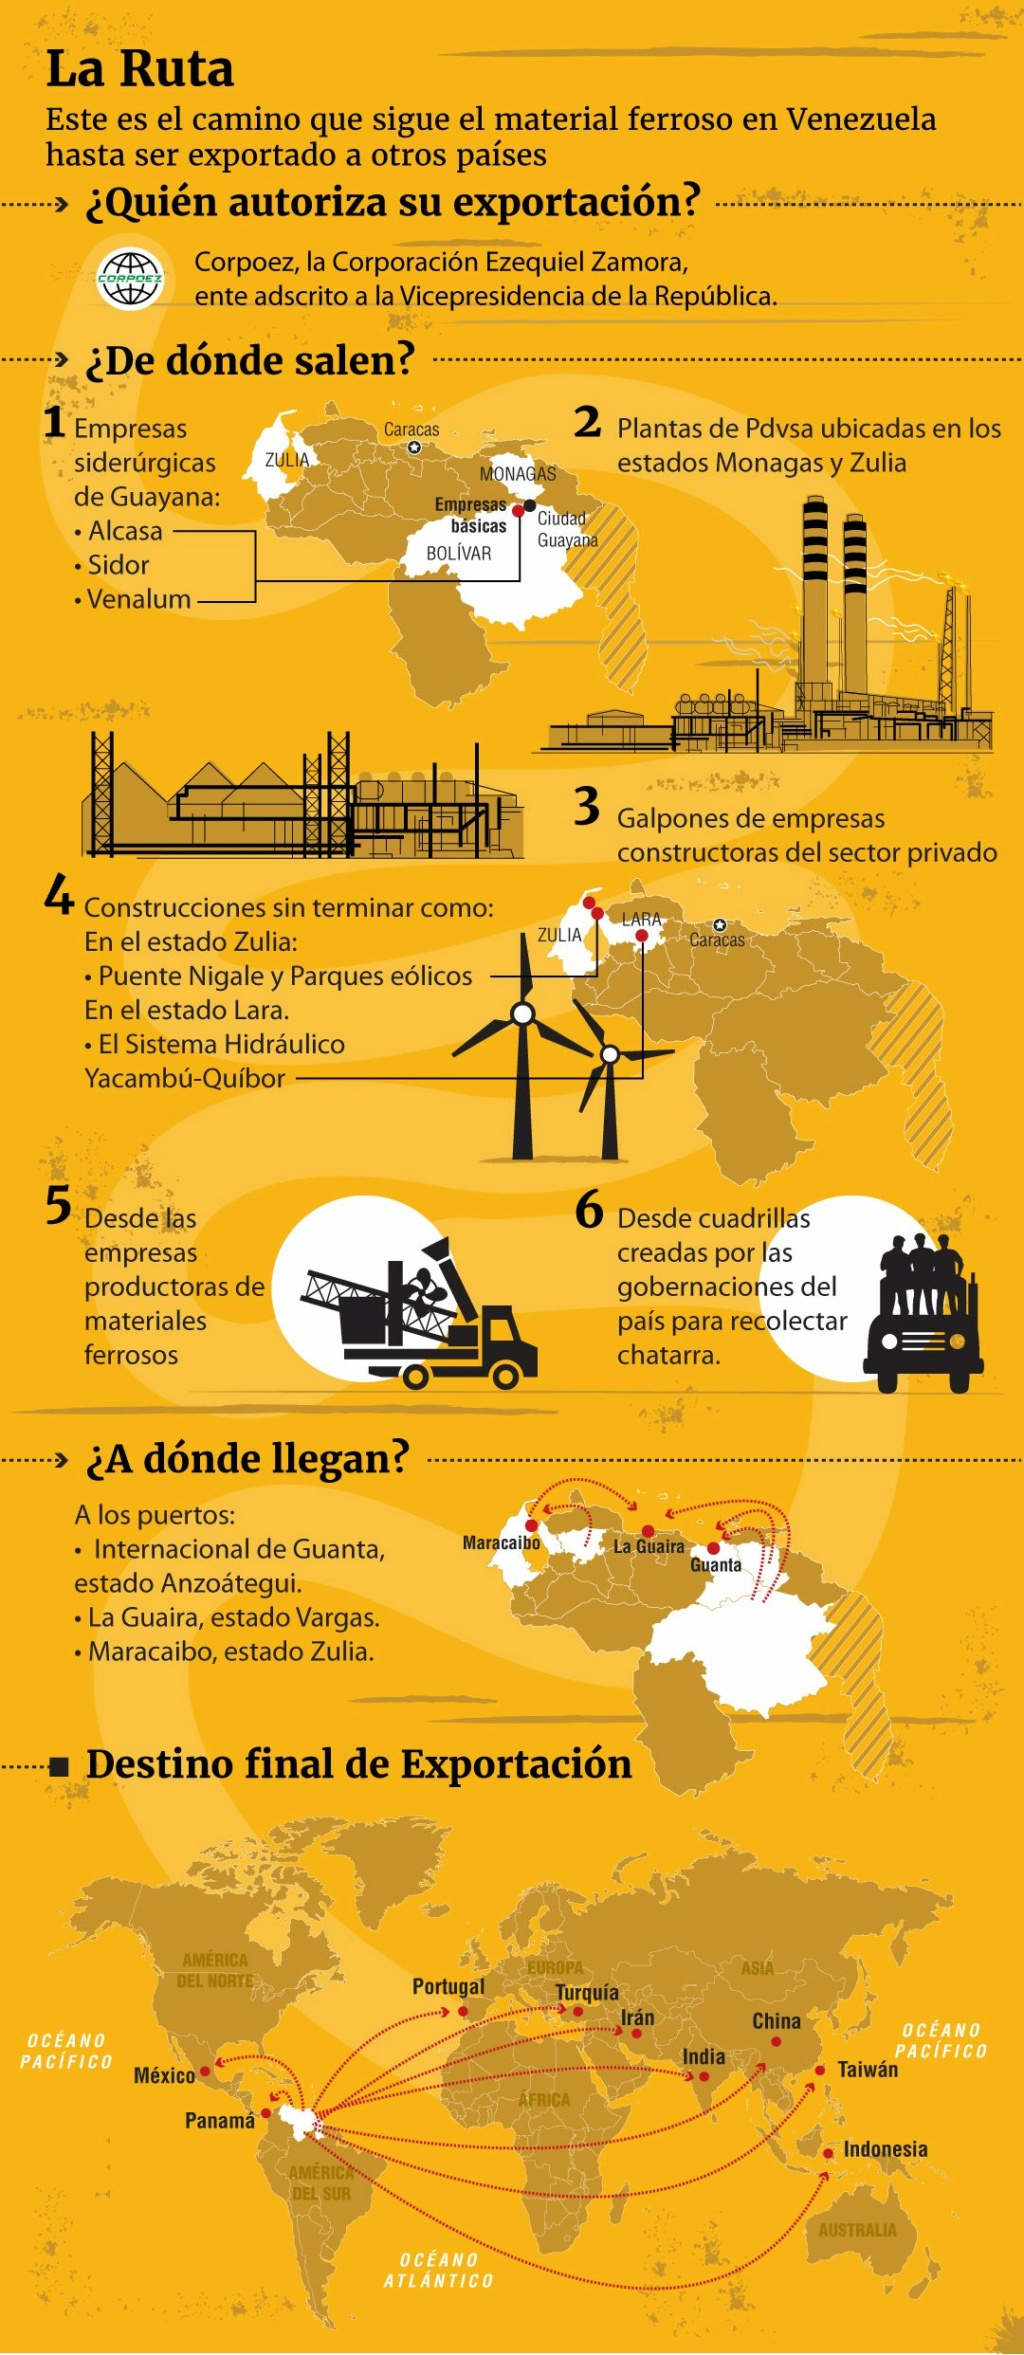 Venezuela Noticias Positivas - Página 24 3-info10